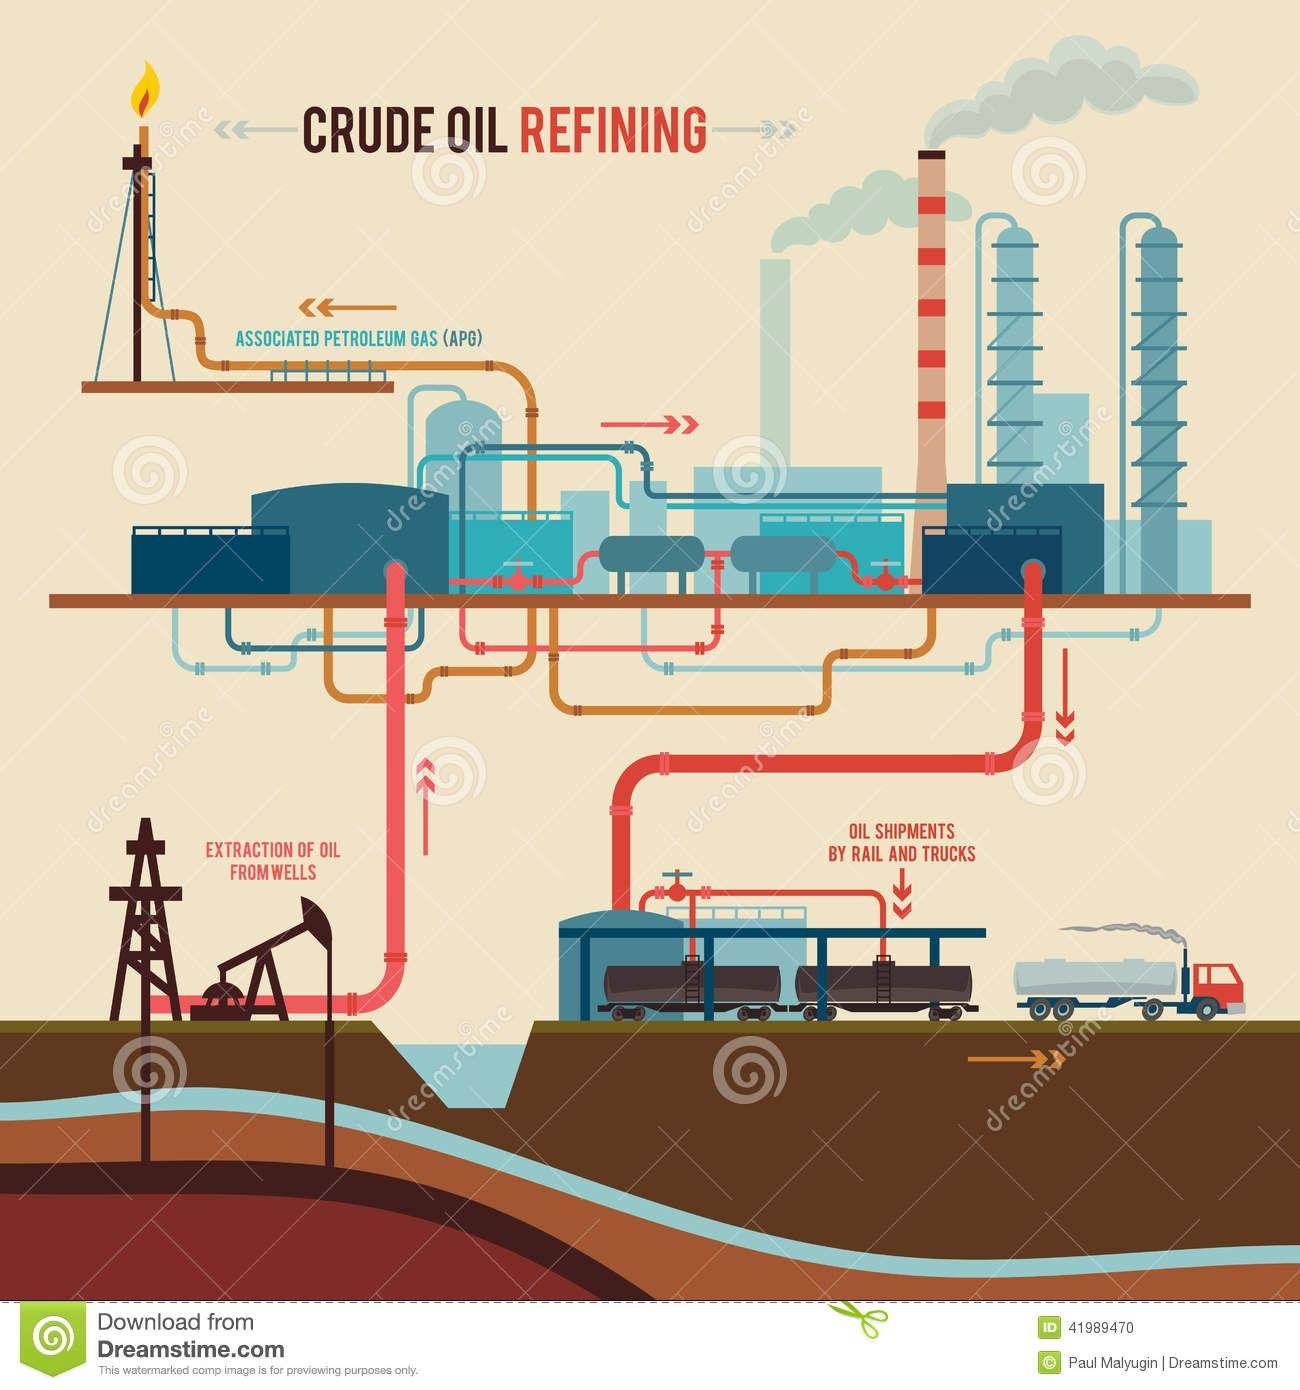 Crude Oil Production Process - Google Search